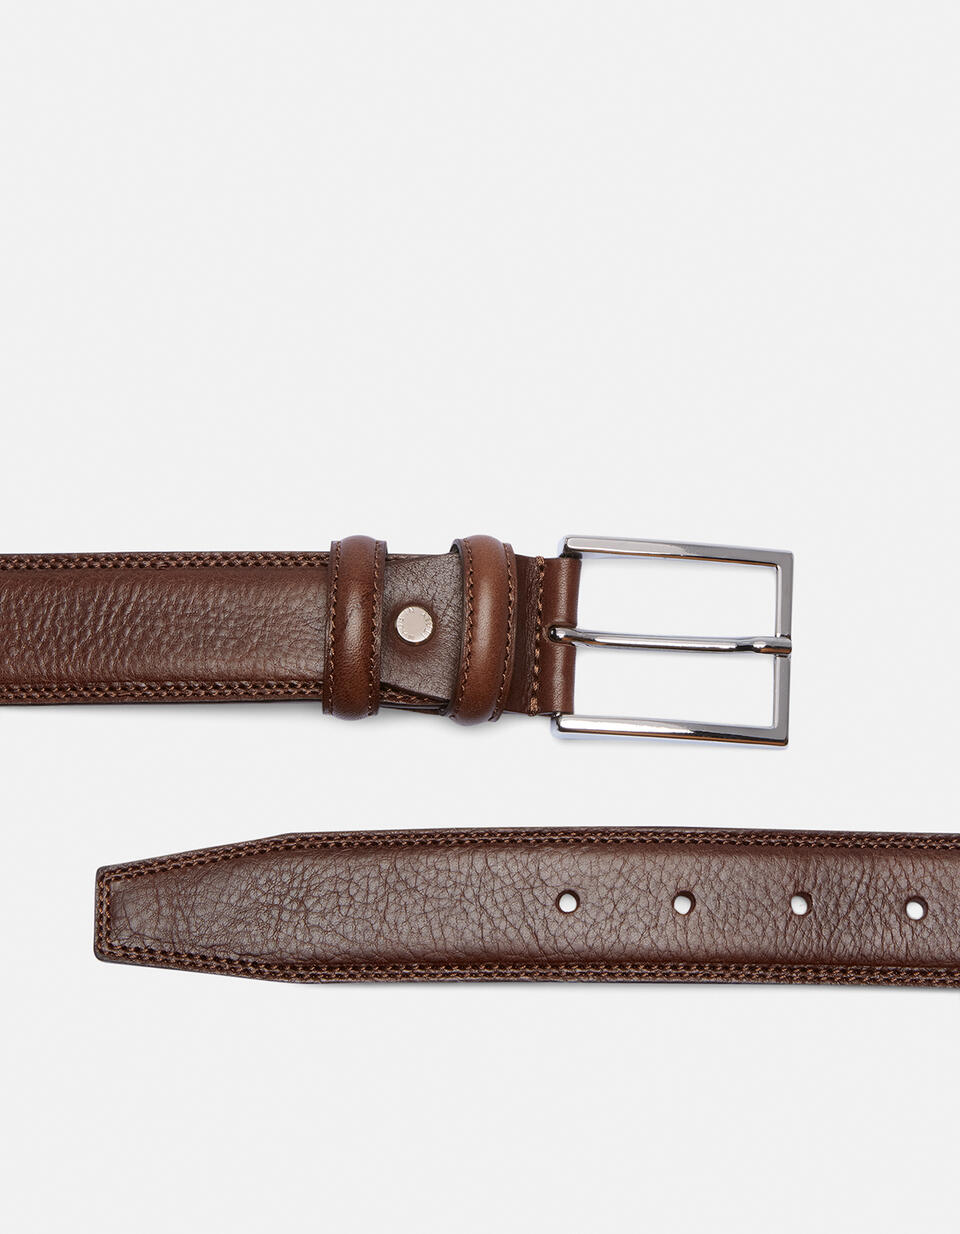 Elegant Leather Belt TESTA DI MORO Cuoieria Fiorentina